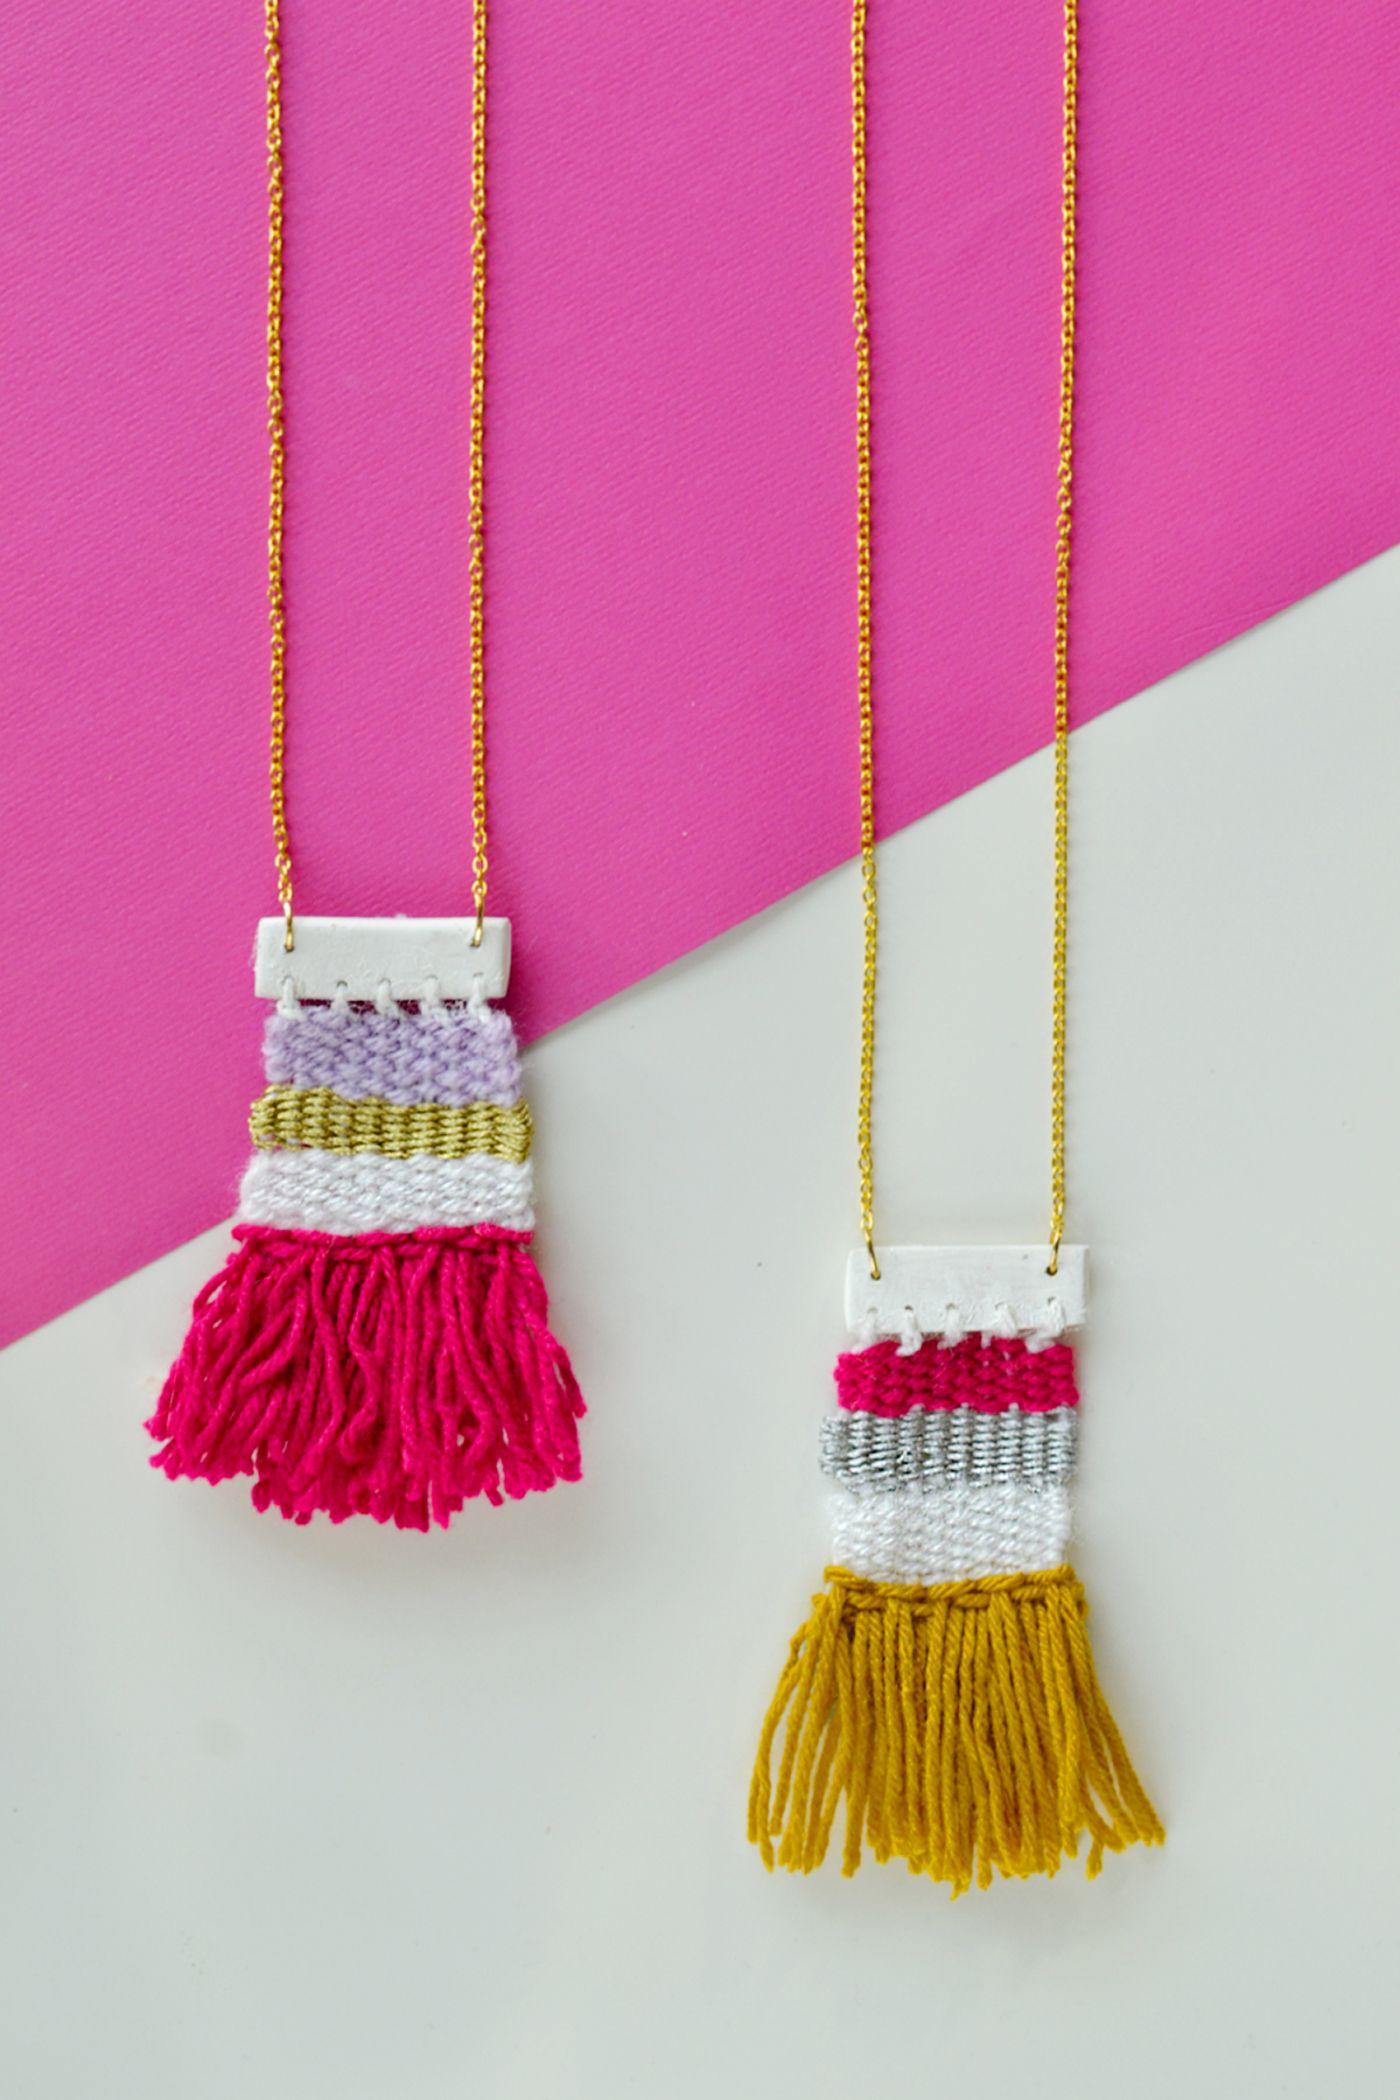 diy woven necklace for diys | diys, craft and macrame